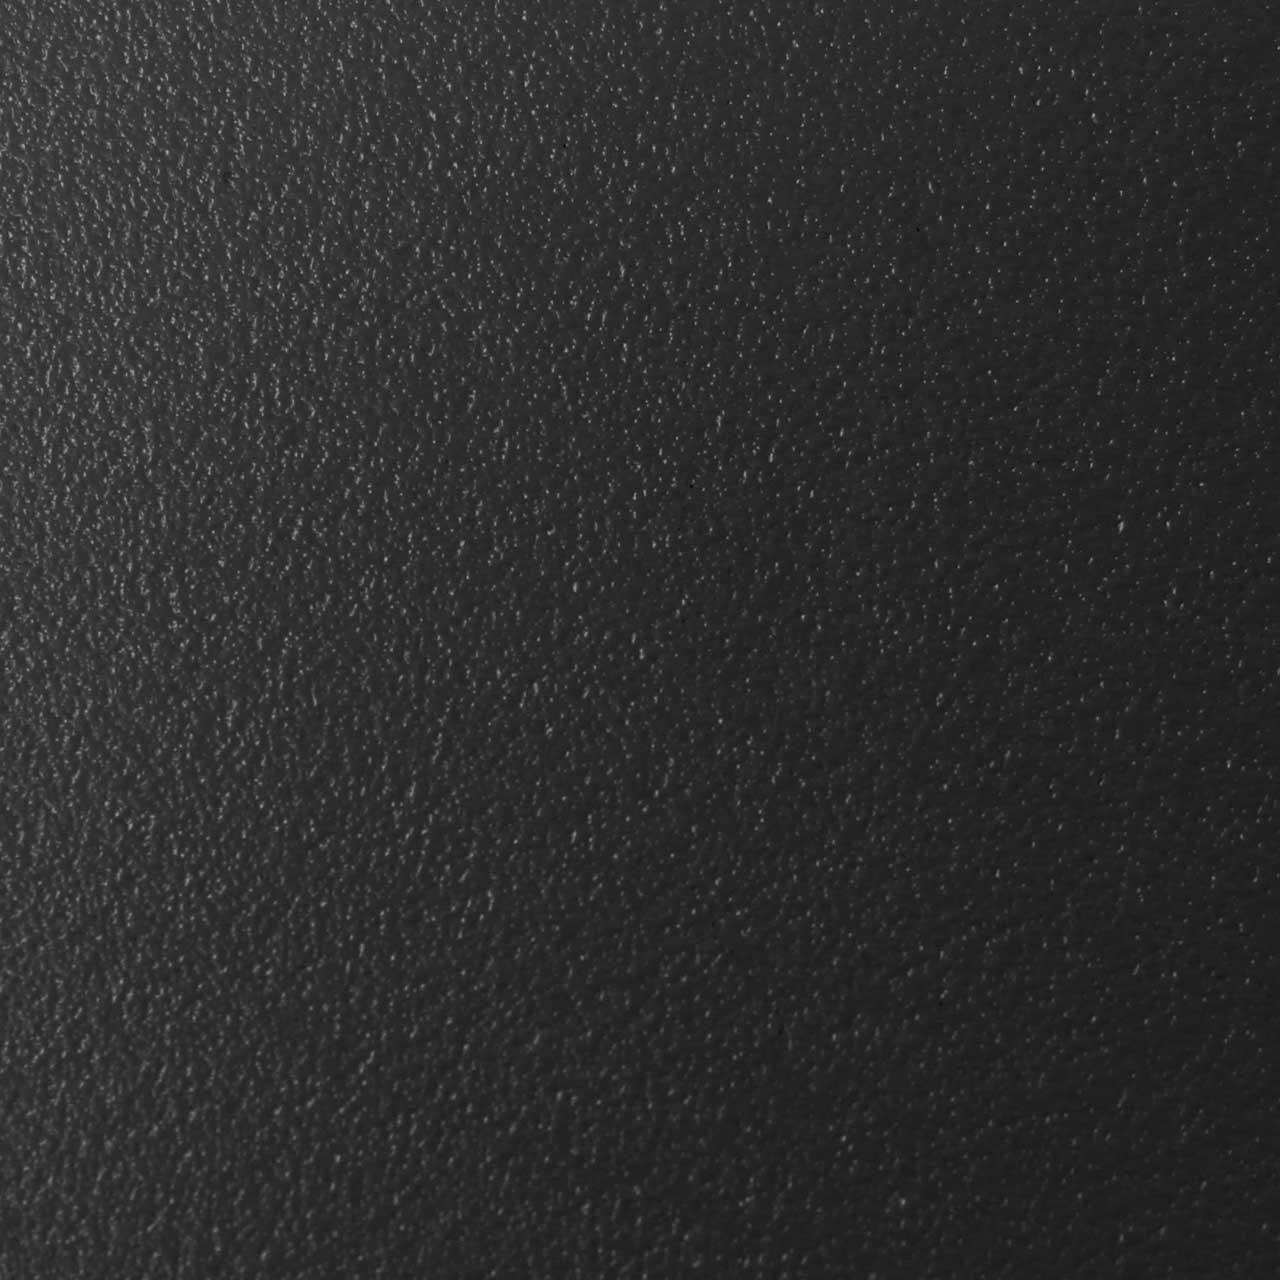 18 X 24 Black Cutting Board Cutting Board Company